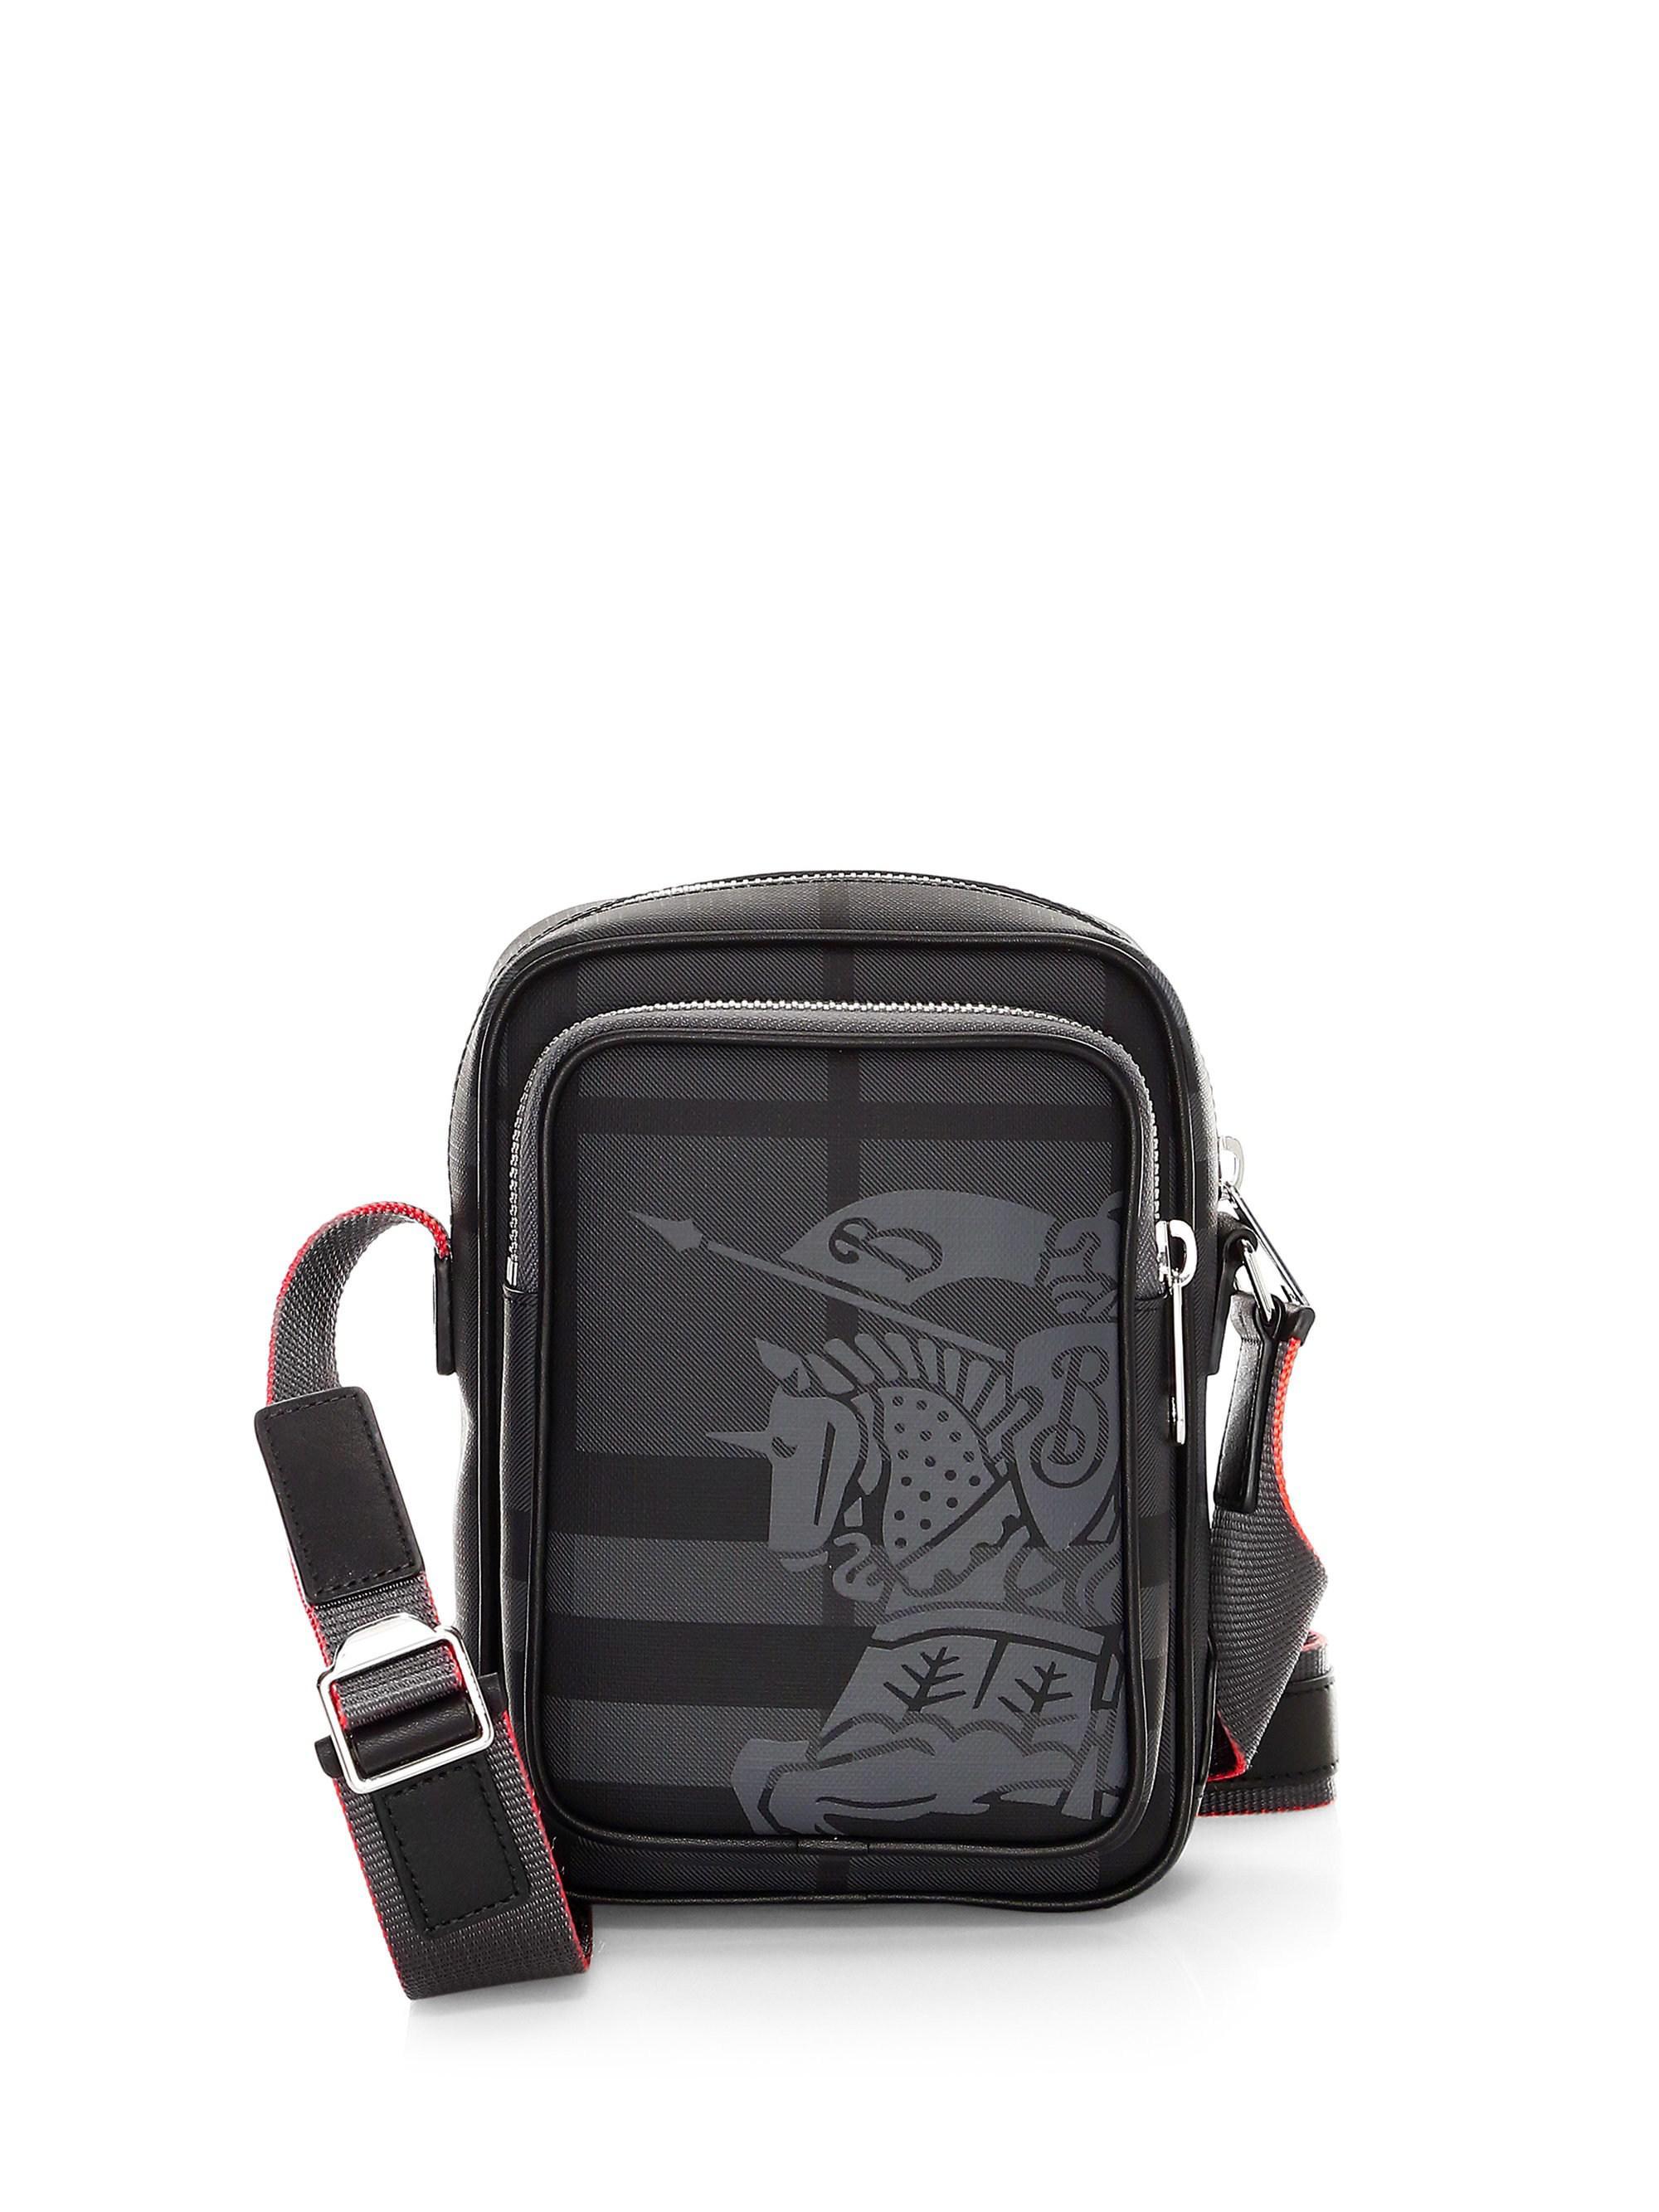 13ed34c8e33a Lyst - Burberry Freddie Crossbody Bag in Black for Men